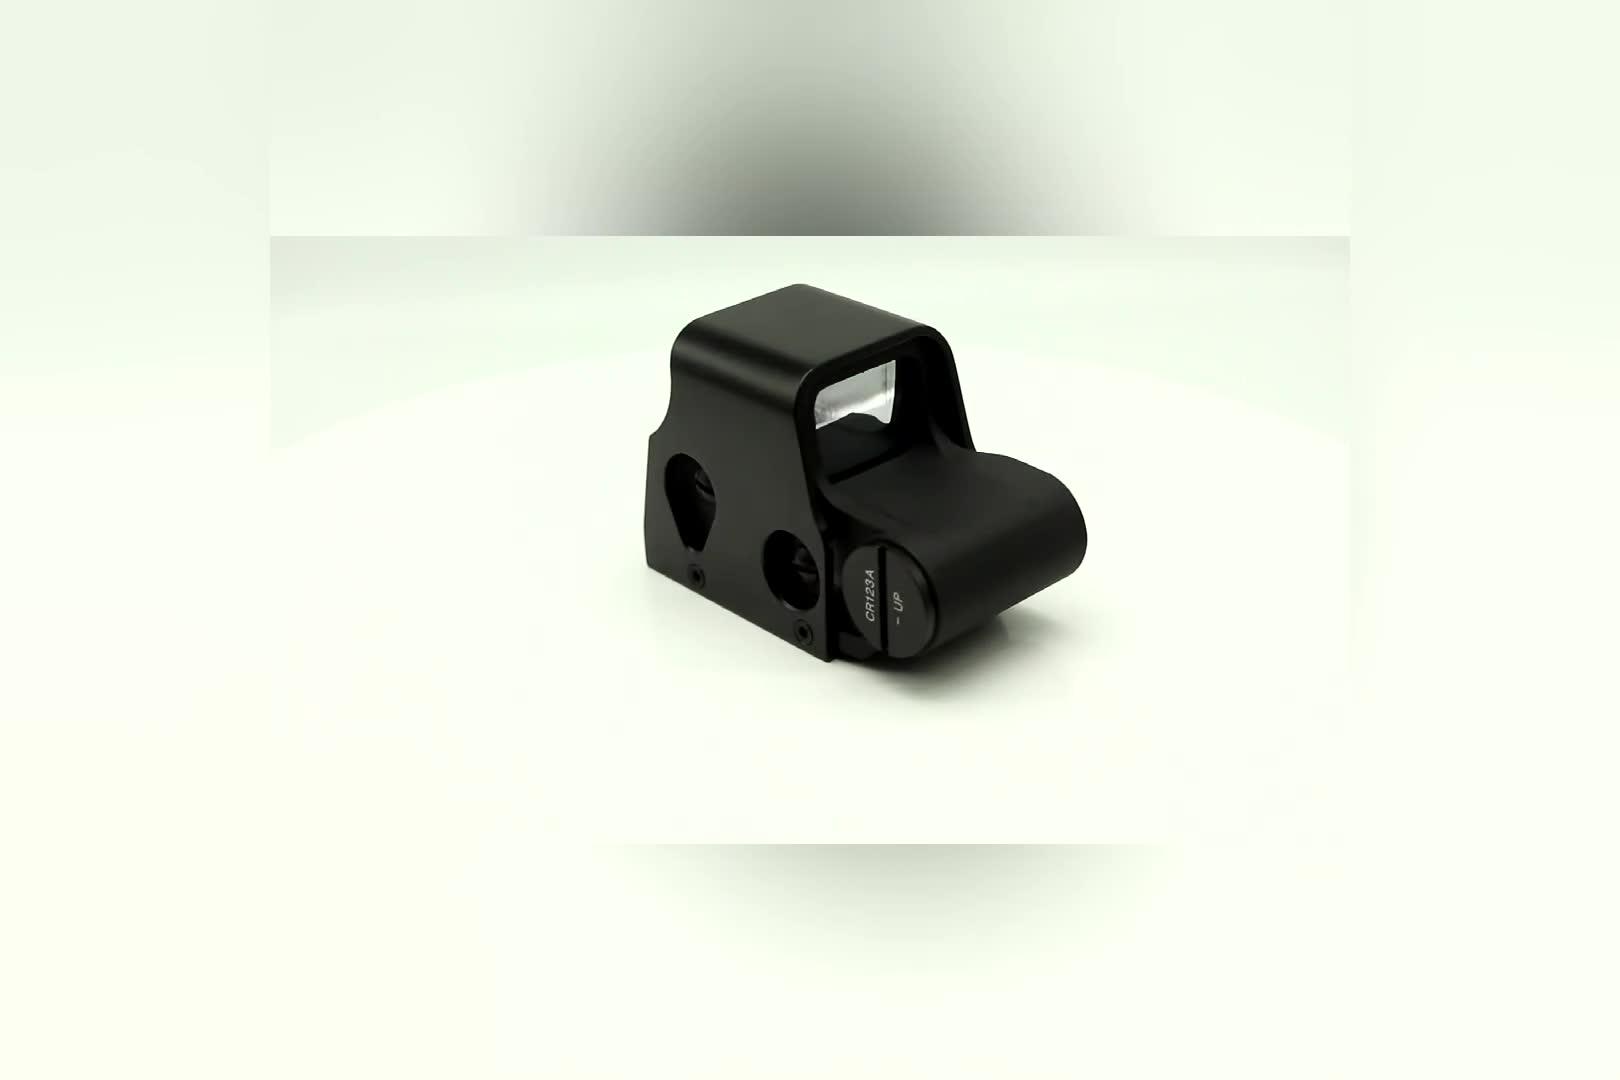 553 Light Adjustable Brightness Mini Holographic Reflex Sight Red Green Dot Sight